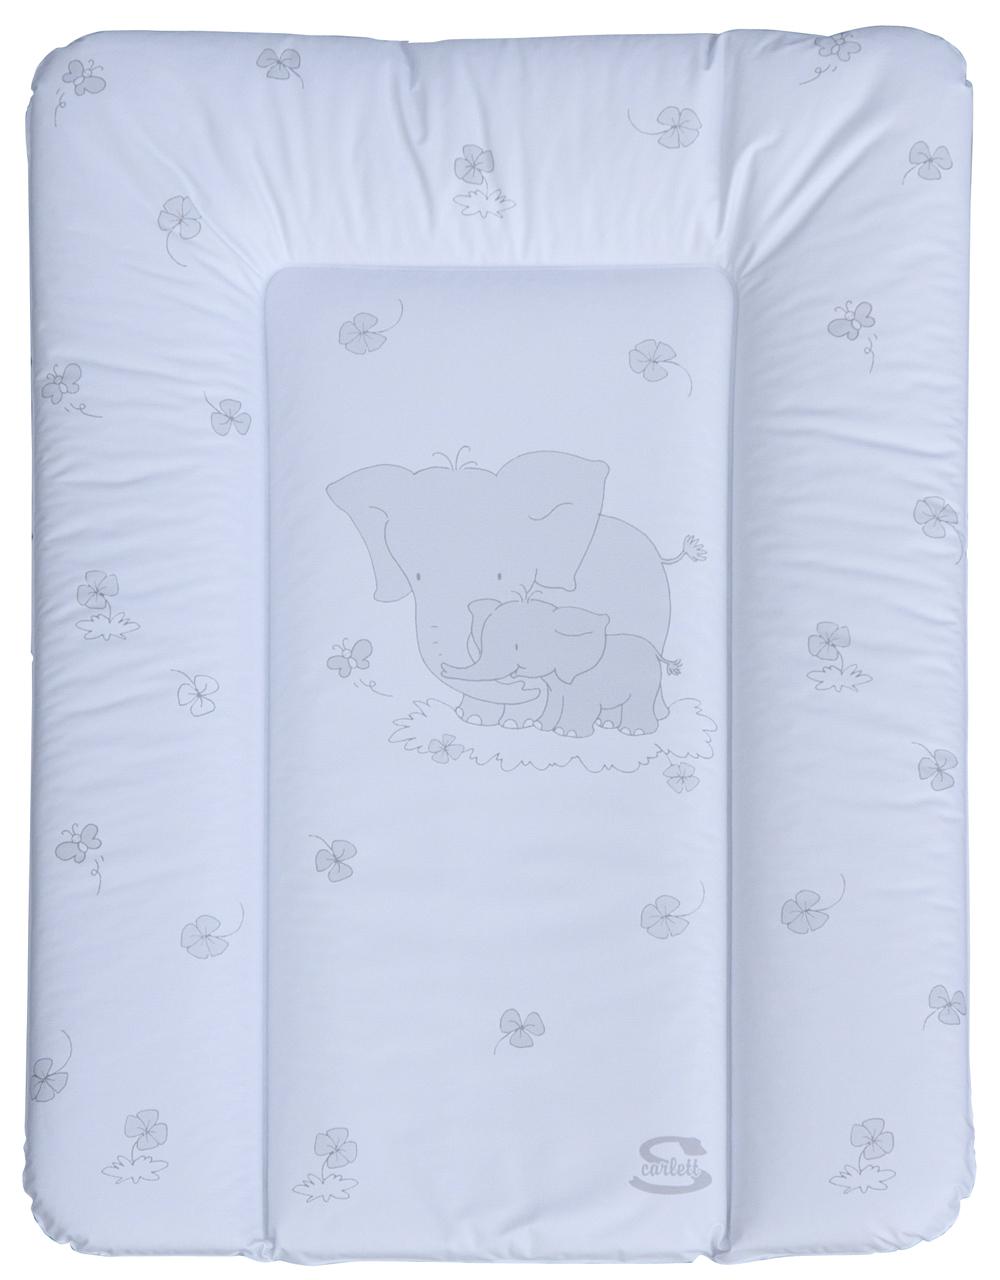 Podložka na komodu Scarlett Bimbo - bílá - 50 x 72 cm